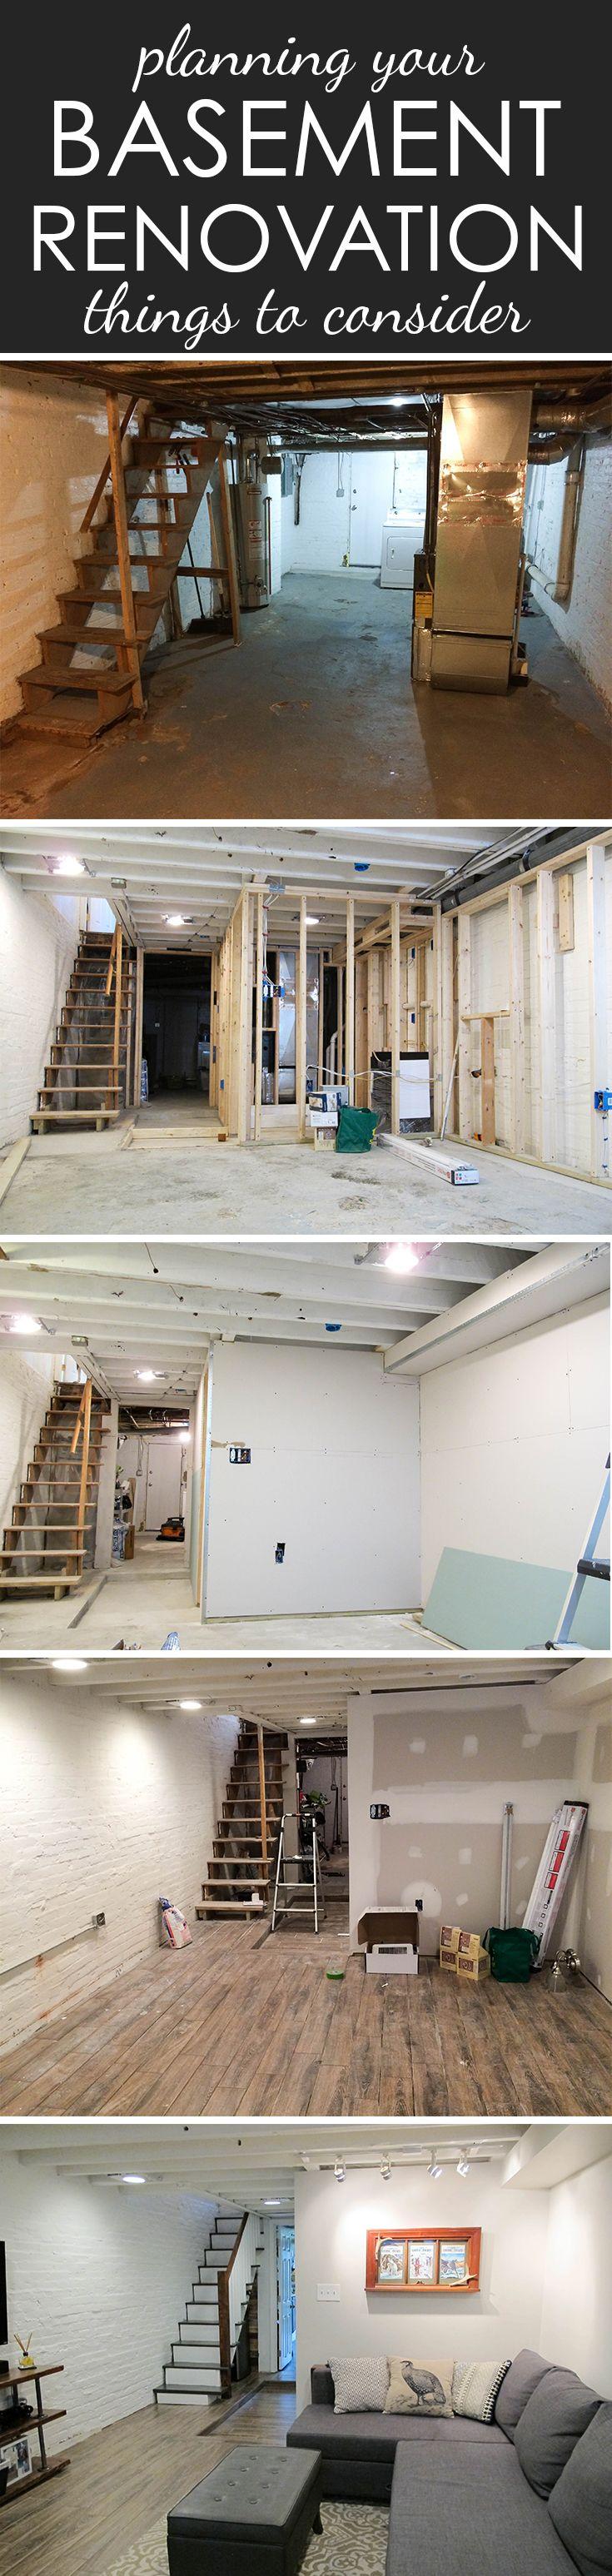 Planning A Basement Renovation Below Grade Plumbing Framing Basement Renovations Renovations Add A Bathroom